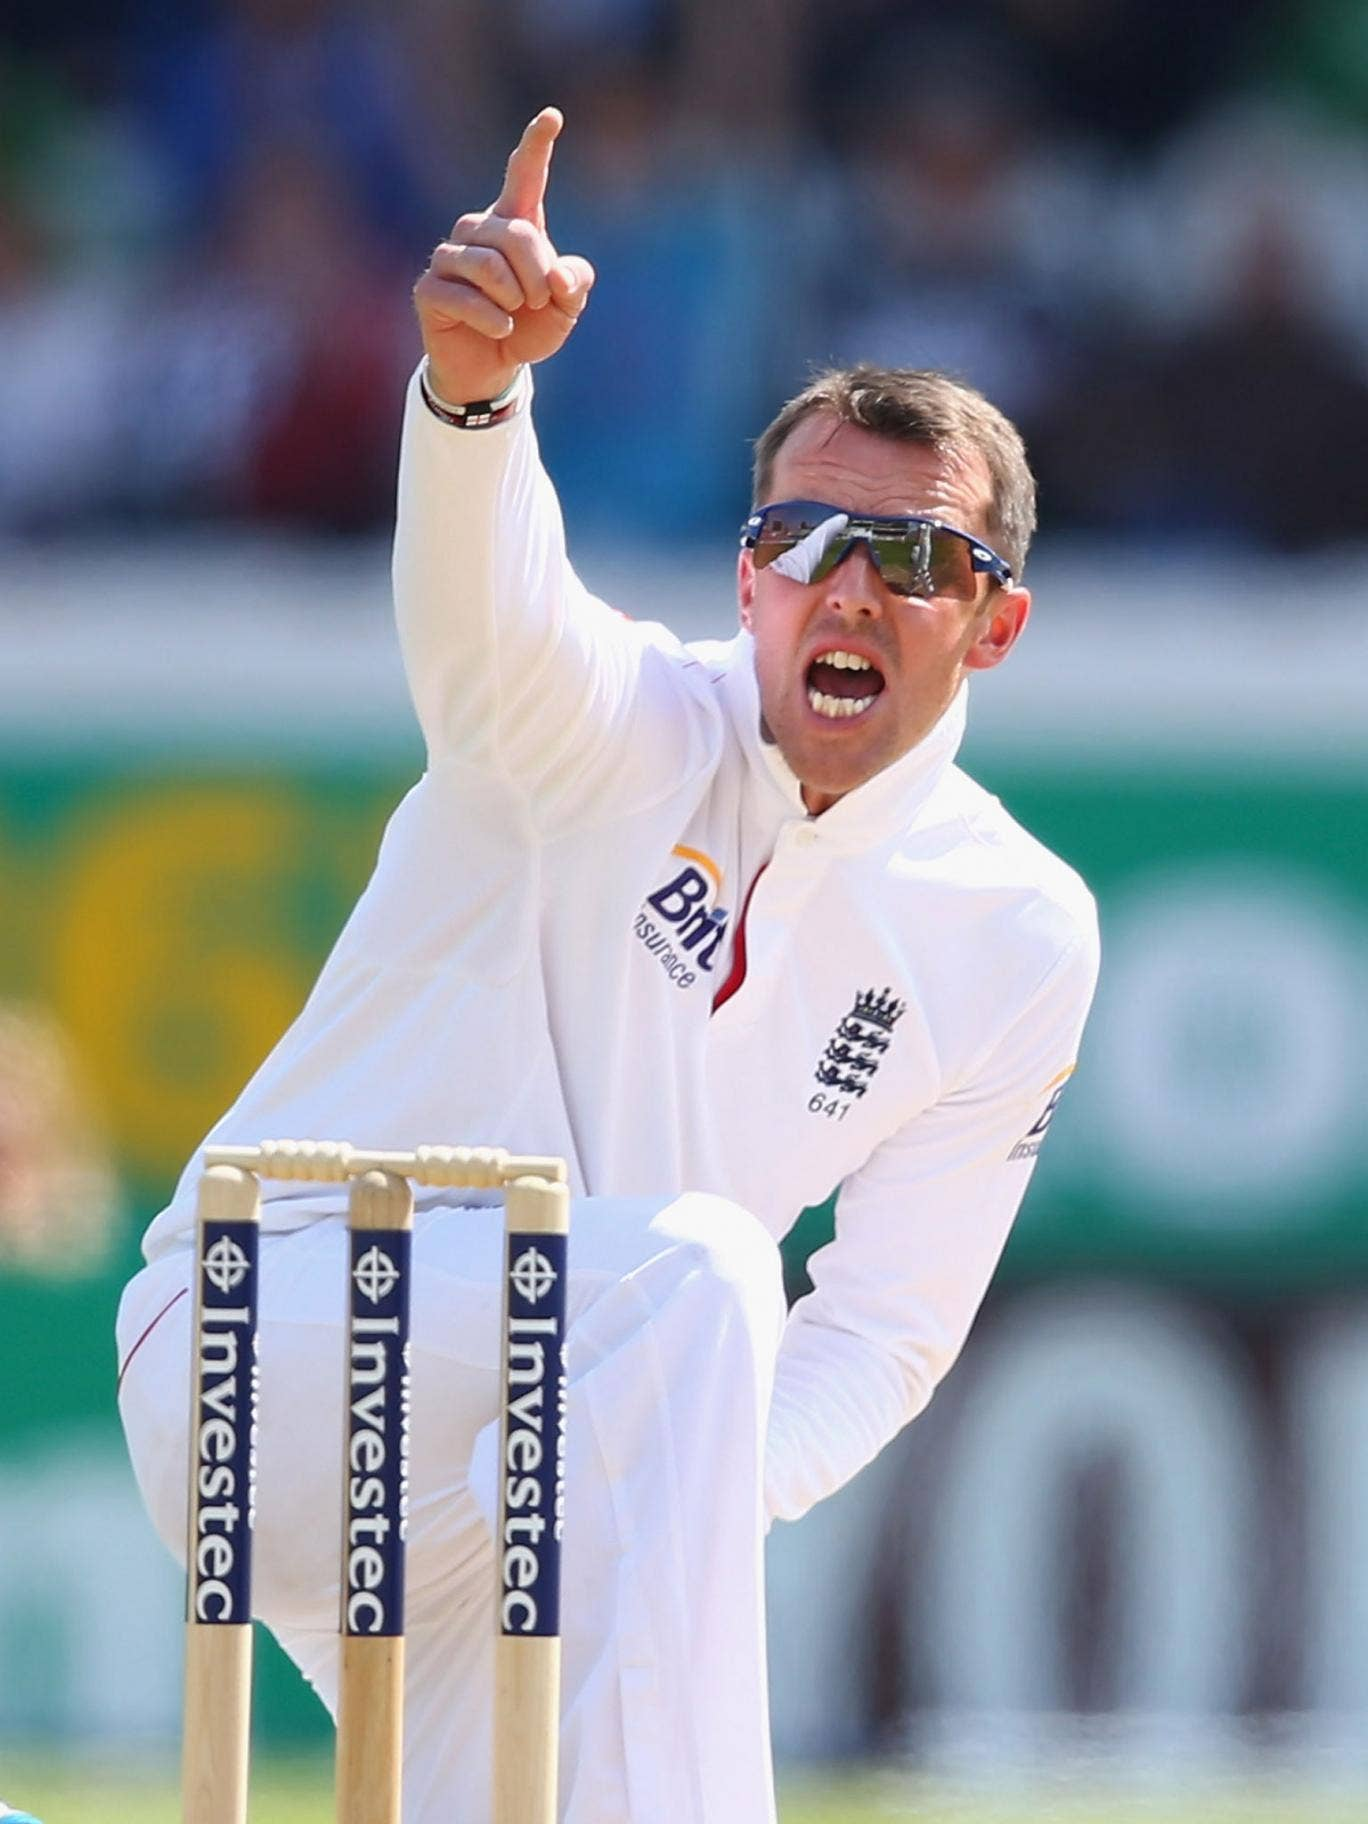 England's Graeme Swann celebrates taking another scalp